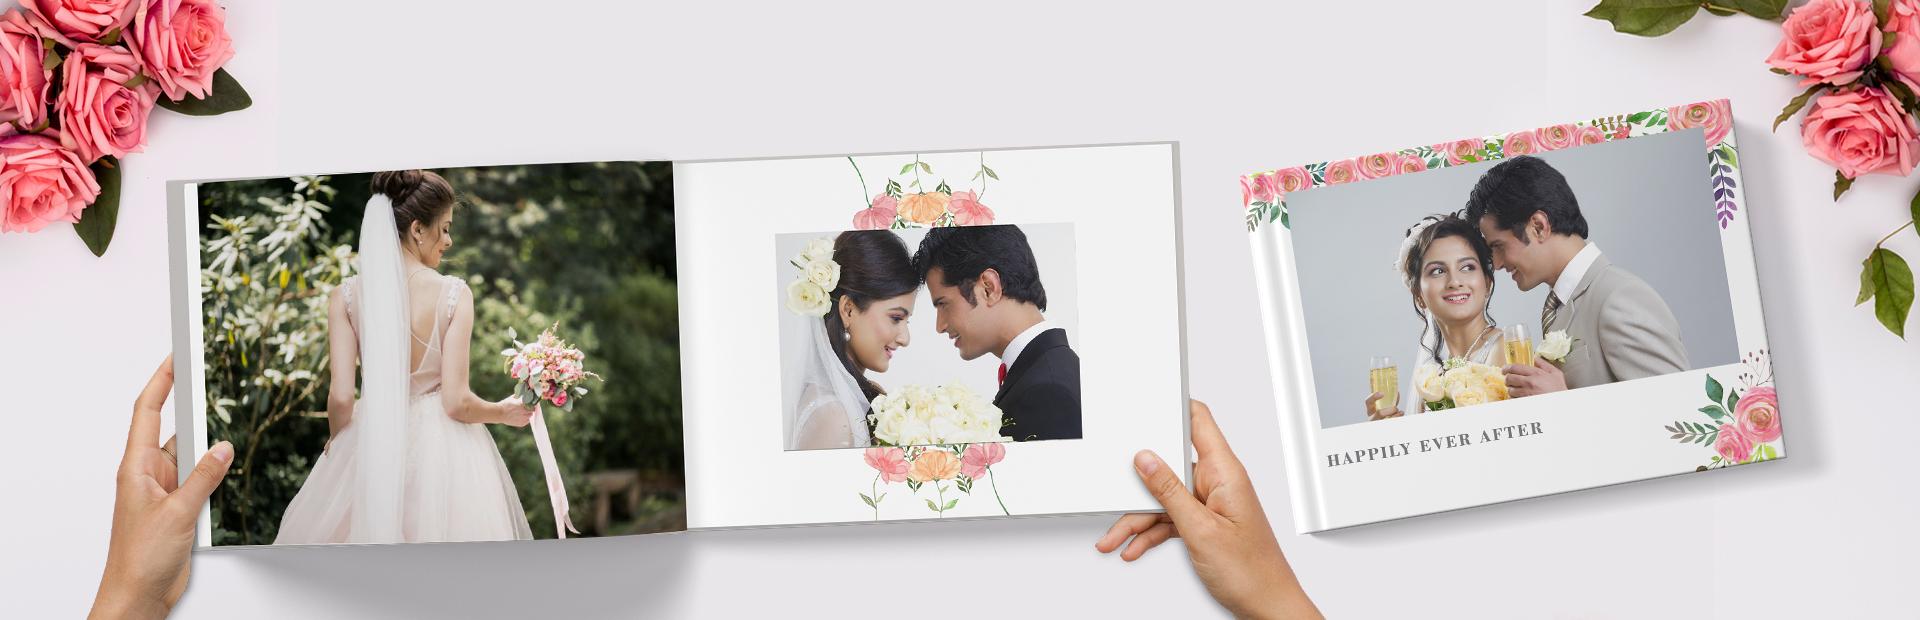 Classic Wedding Photo Books Online